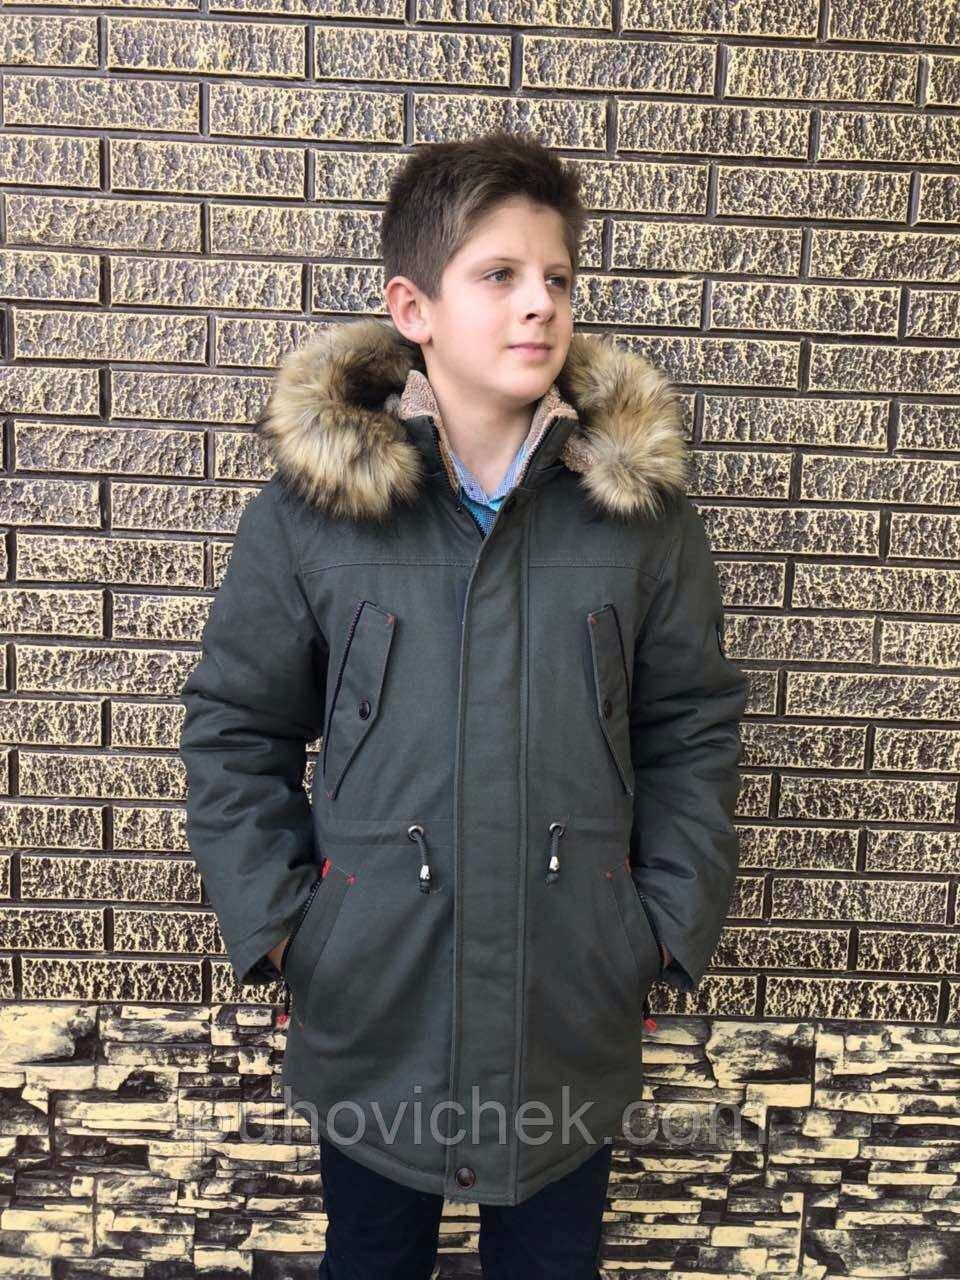 4283b894ed4 Зимняя куртка для мальчика на меху интернет магазин новинка 99 ...